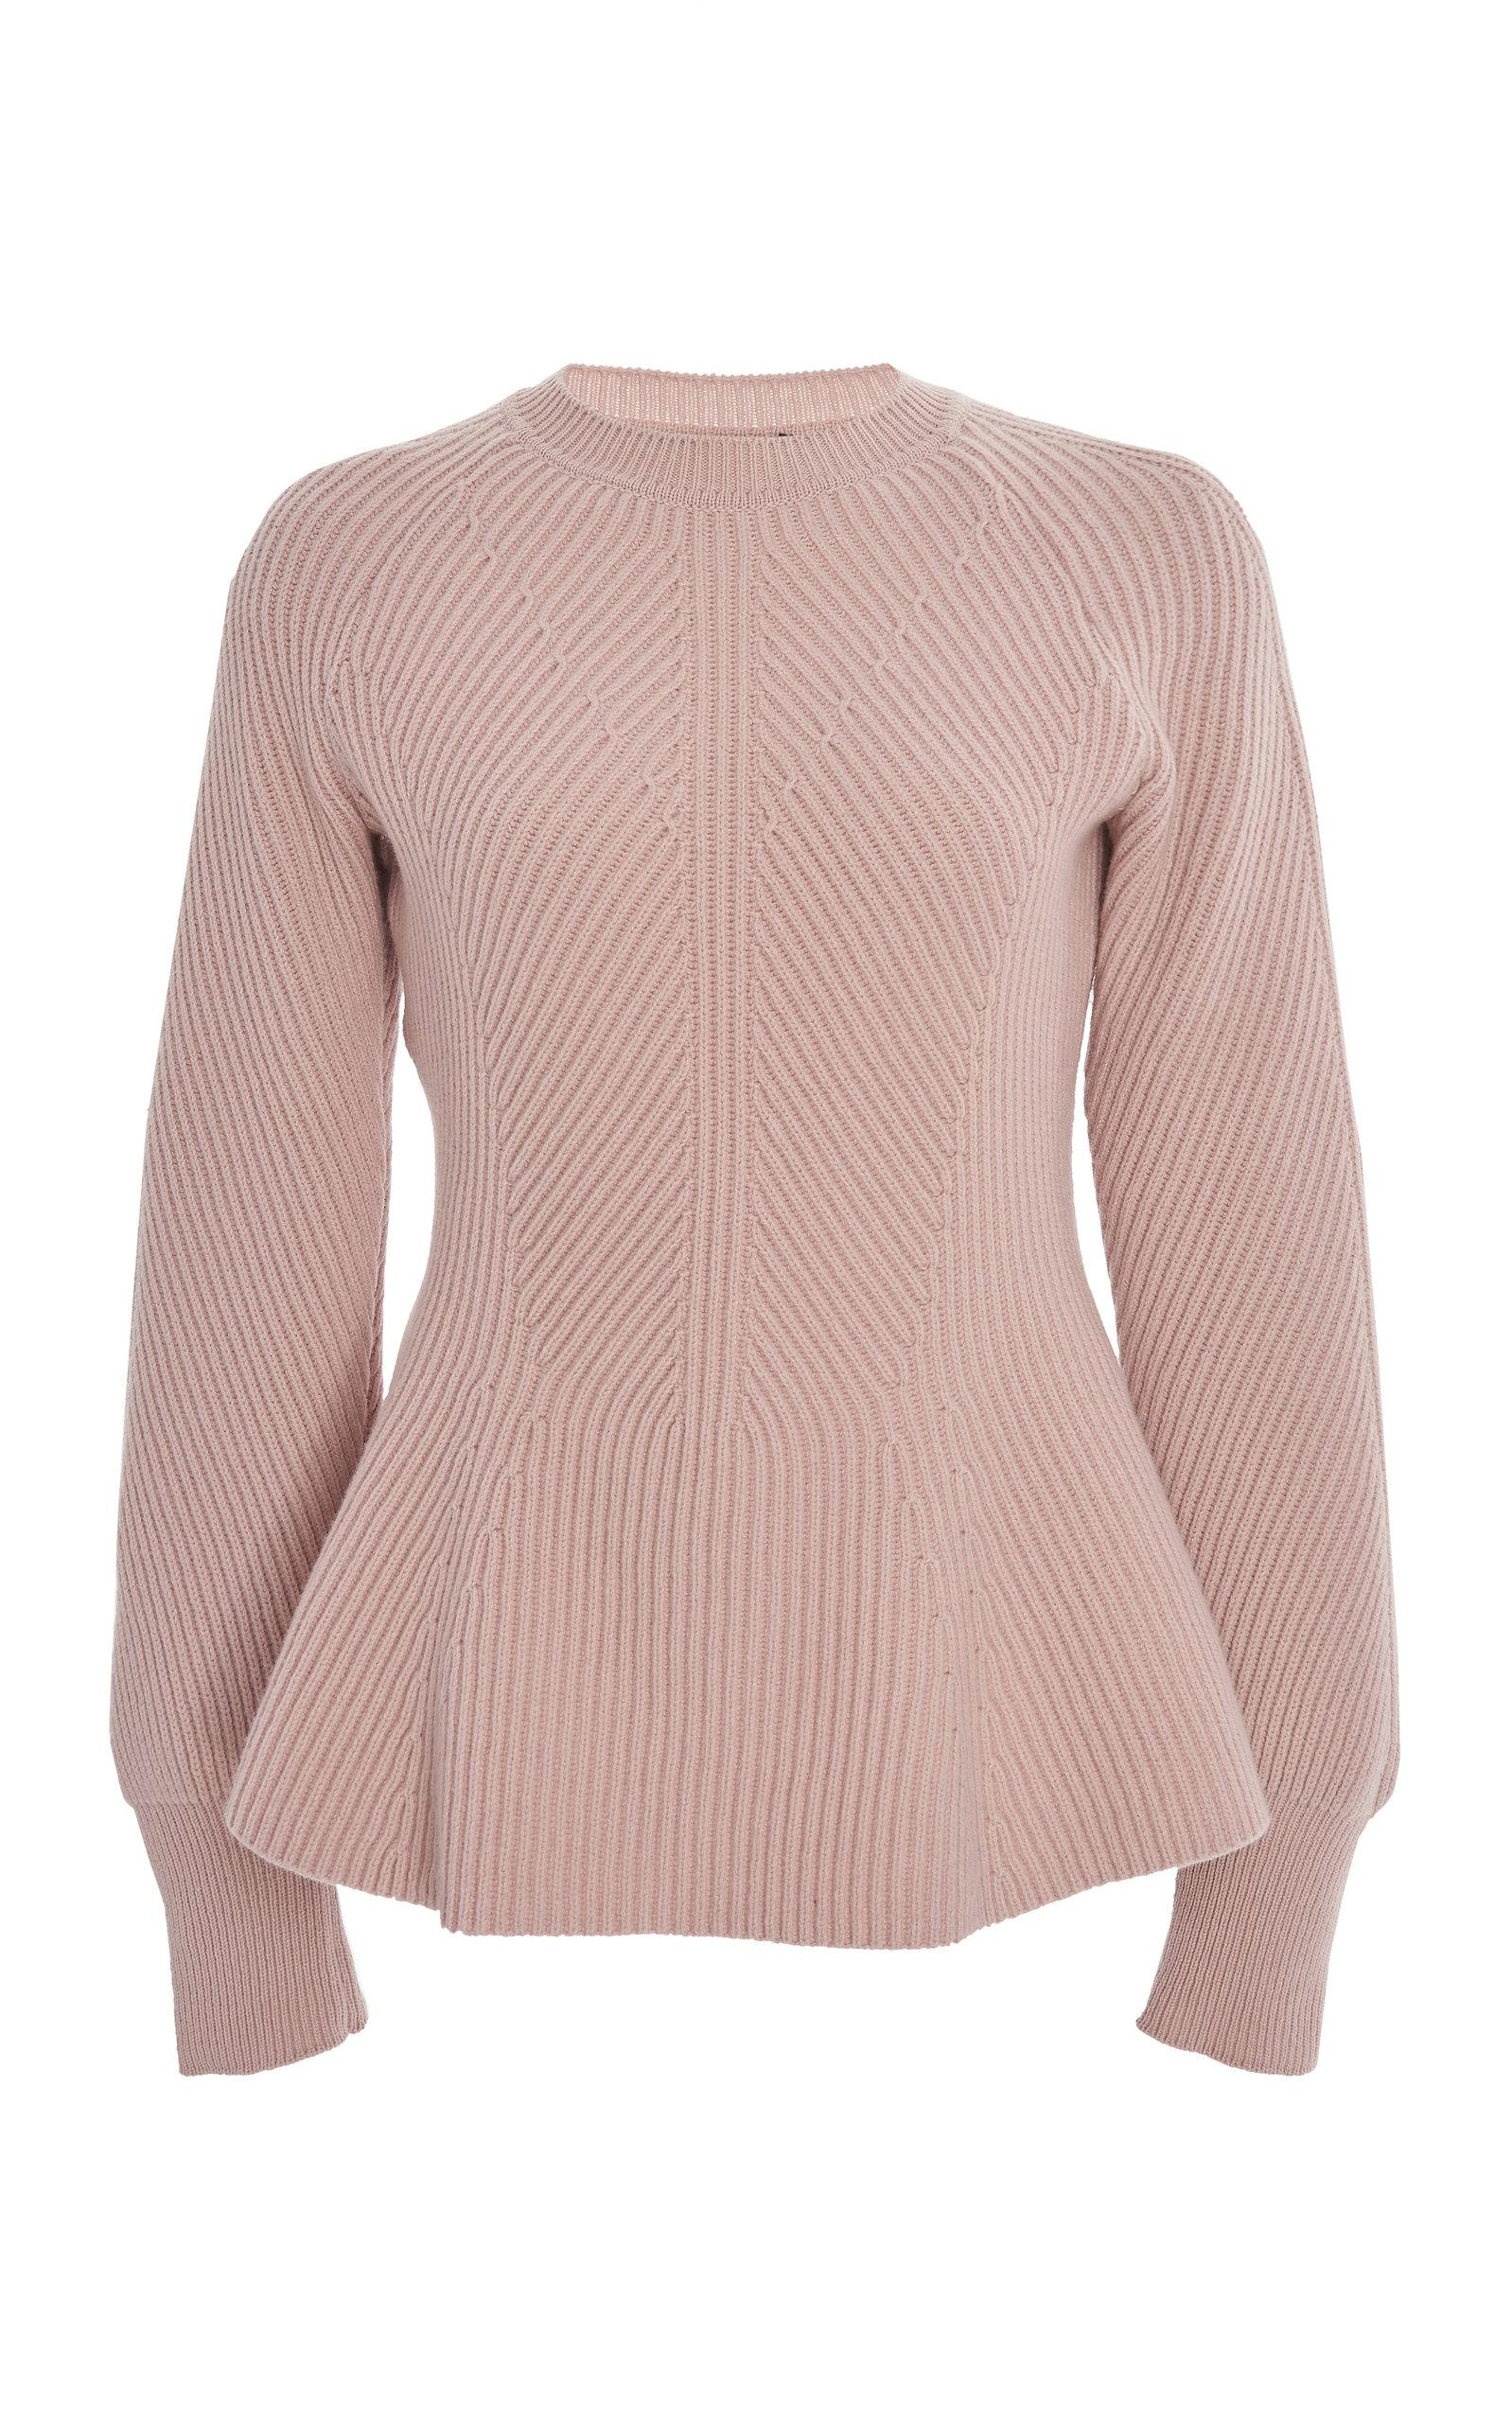 promo code 29395 10230 alberta-ferretti-pink-Wool-Cashmere-Peplum-Sweater.jpeg